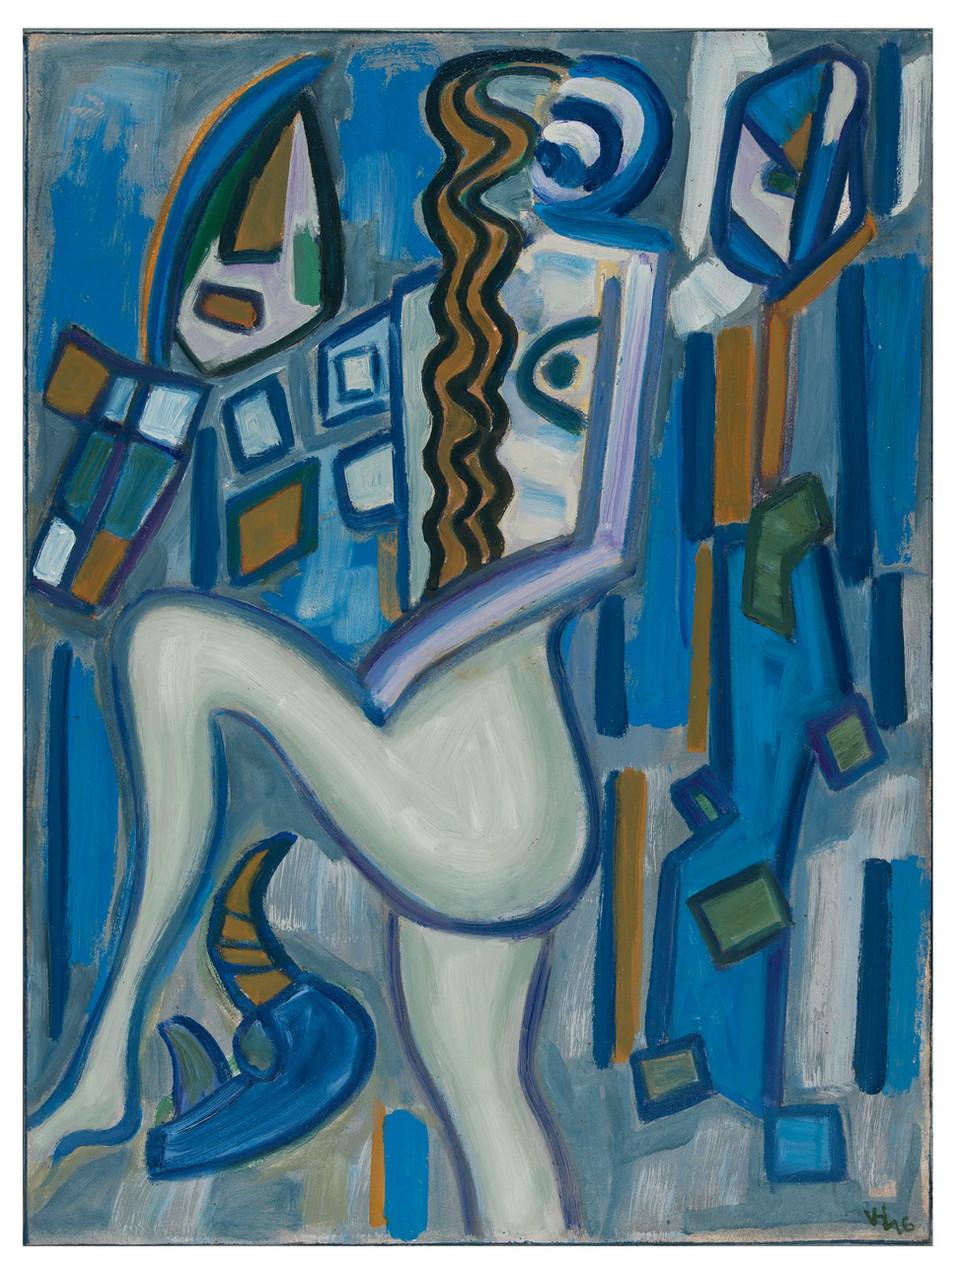 Veit Hofmann | Der Schritt | 2016 | Öl auf Leinwand | gerahmt | 80 x 60 cm | 3400 Euro